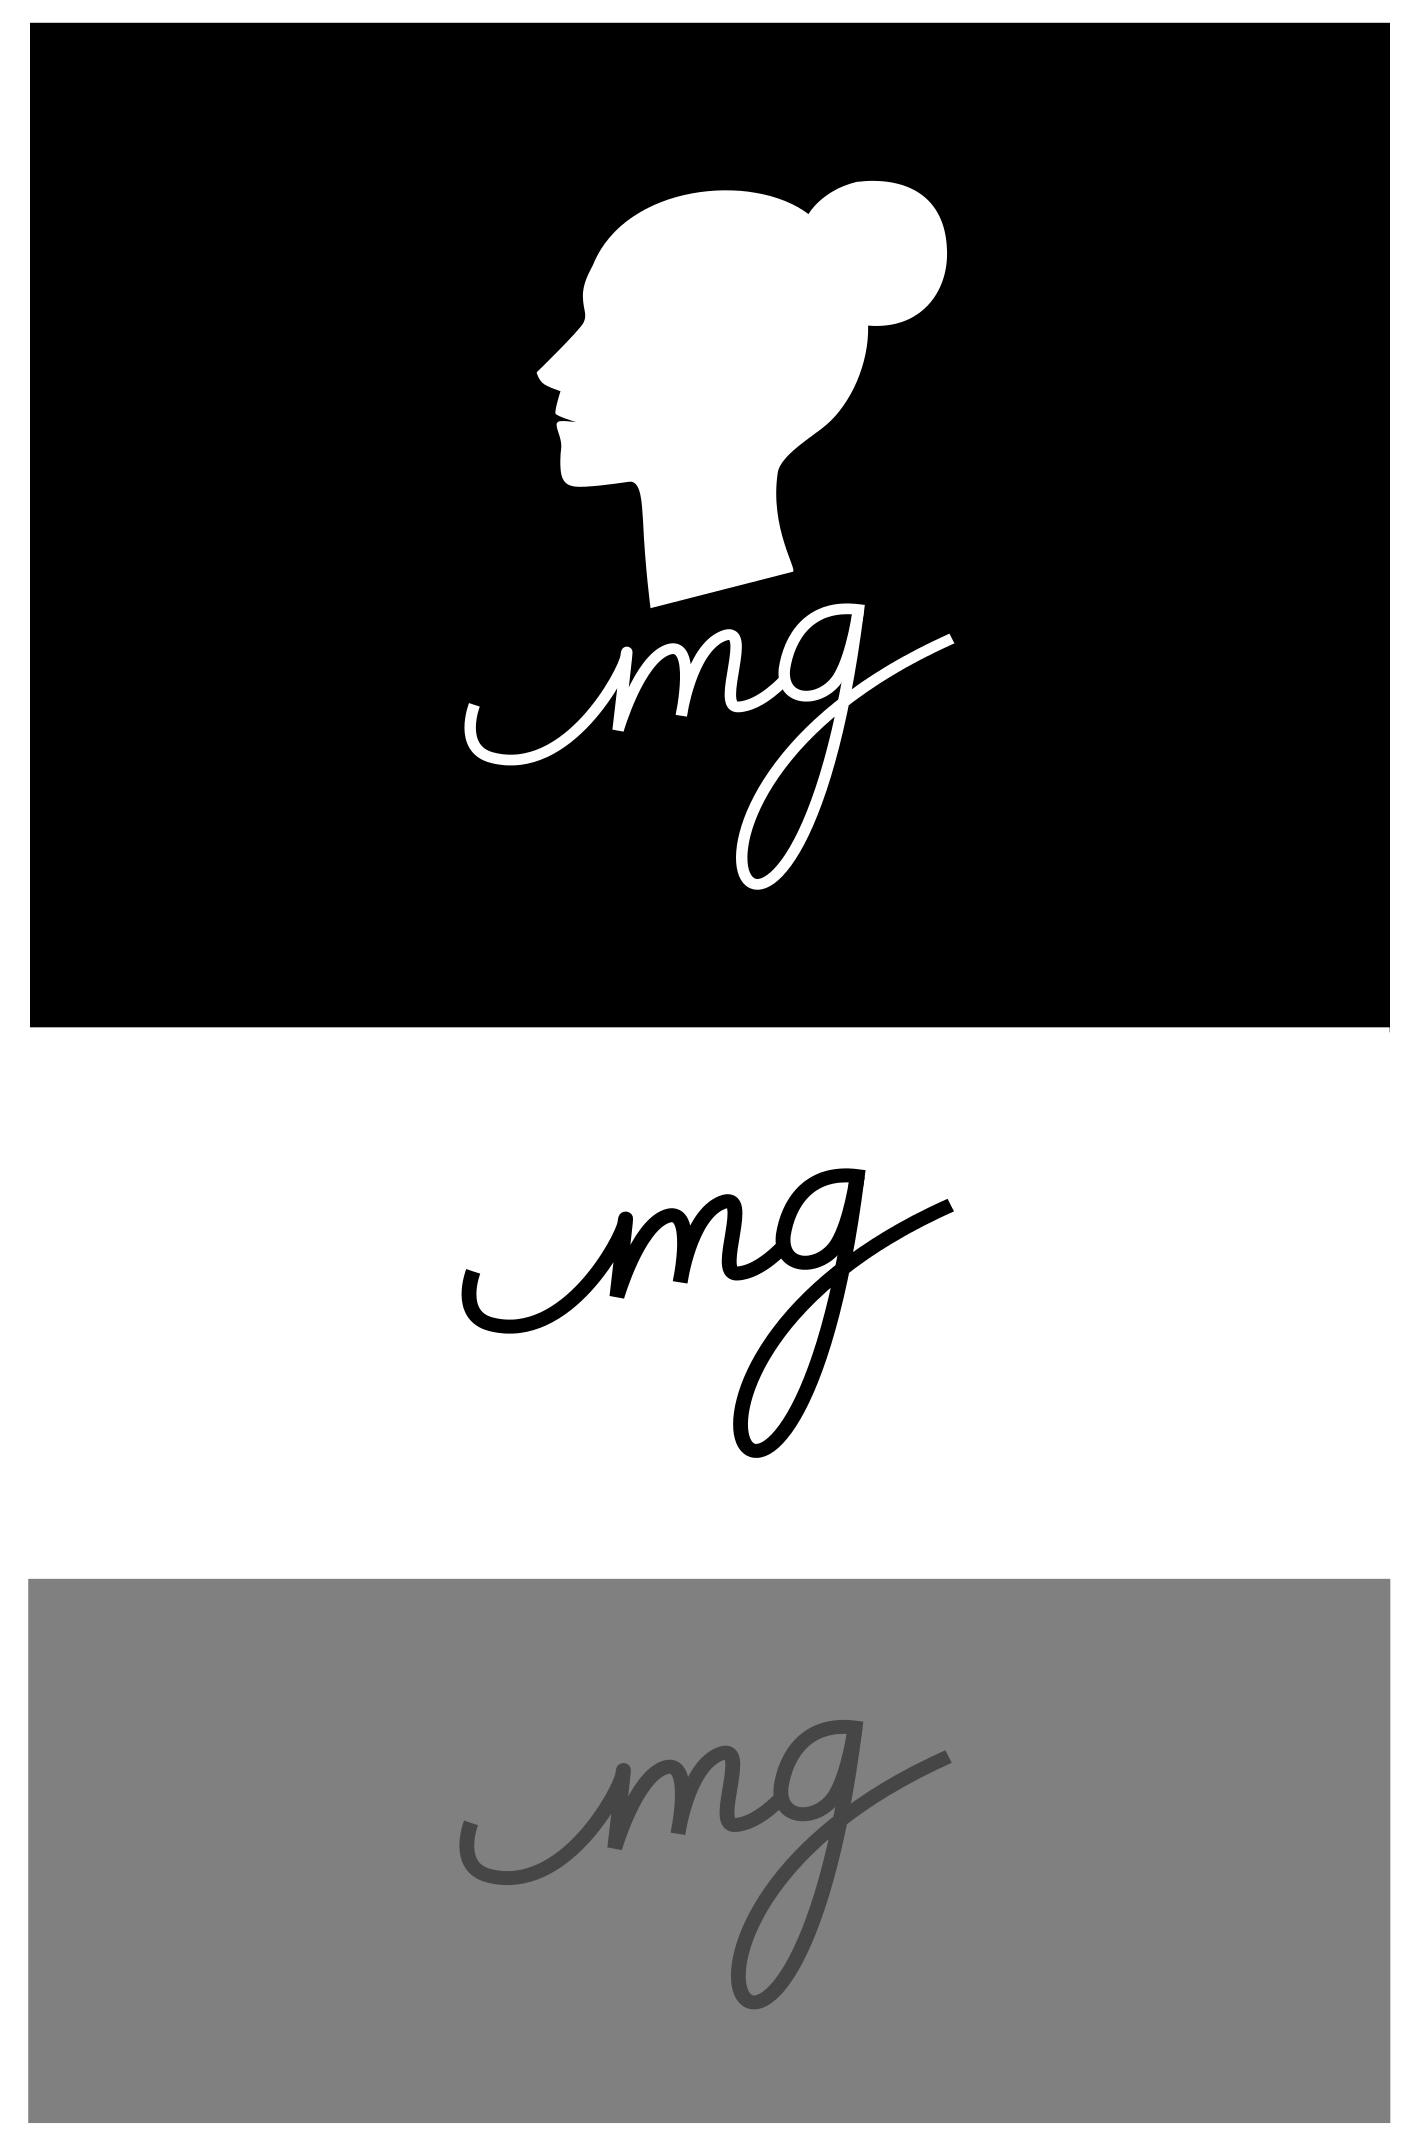 Custom Design by JaroslavProcka - Entry No. 197 in the Custom Design Contest Imaginative Custom Design for MG.